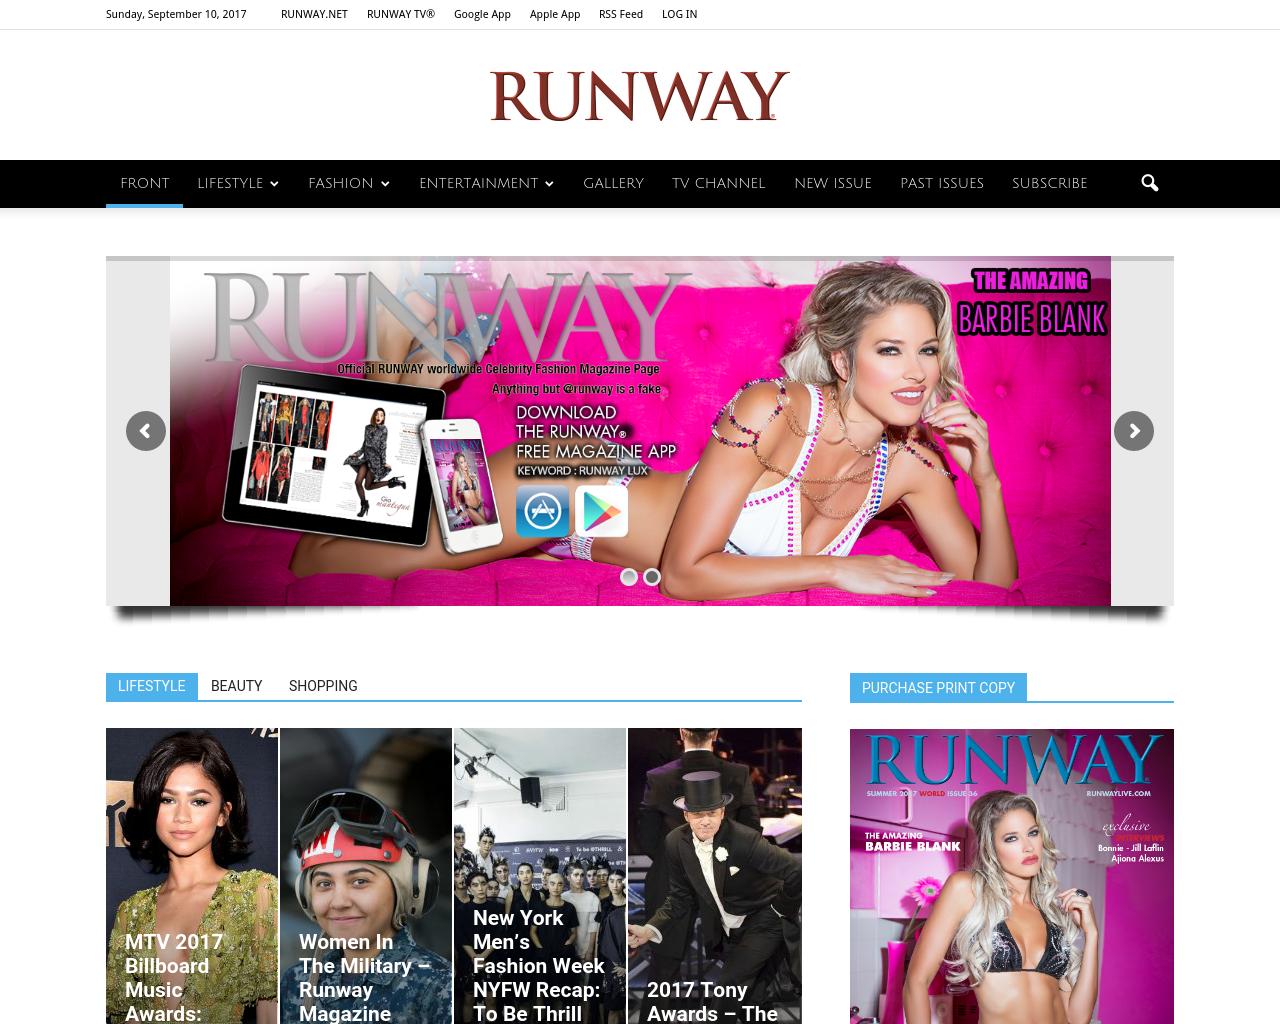 Runway-Media-Advertising-Reviews-Pricing